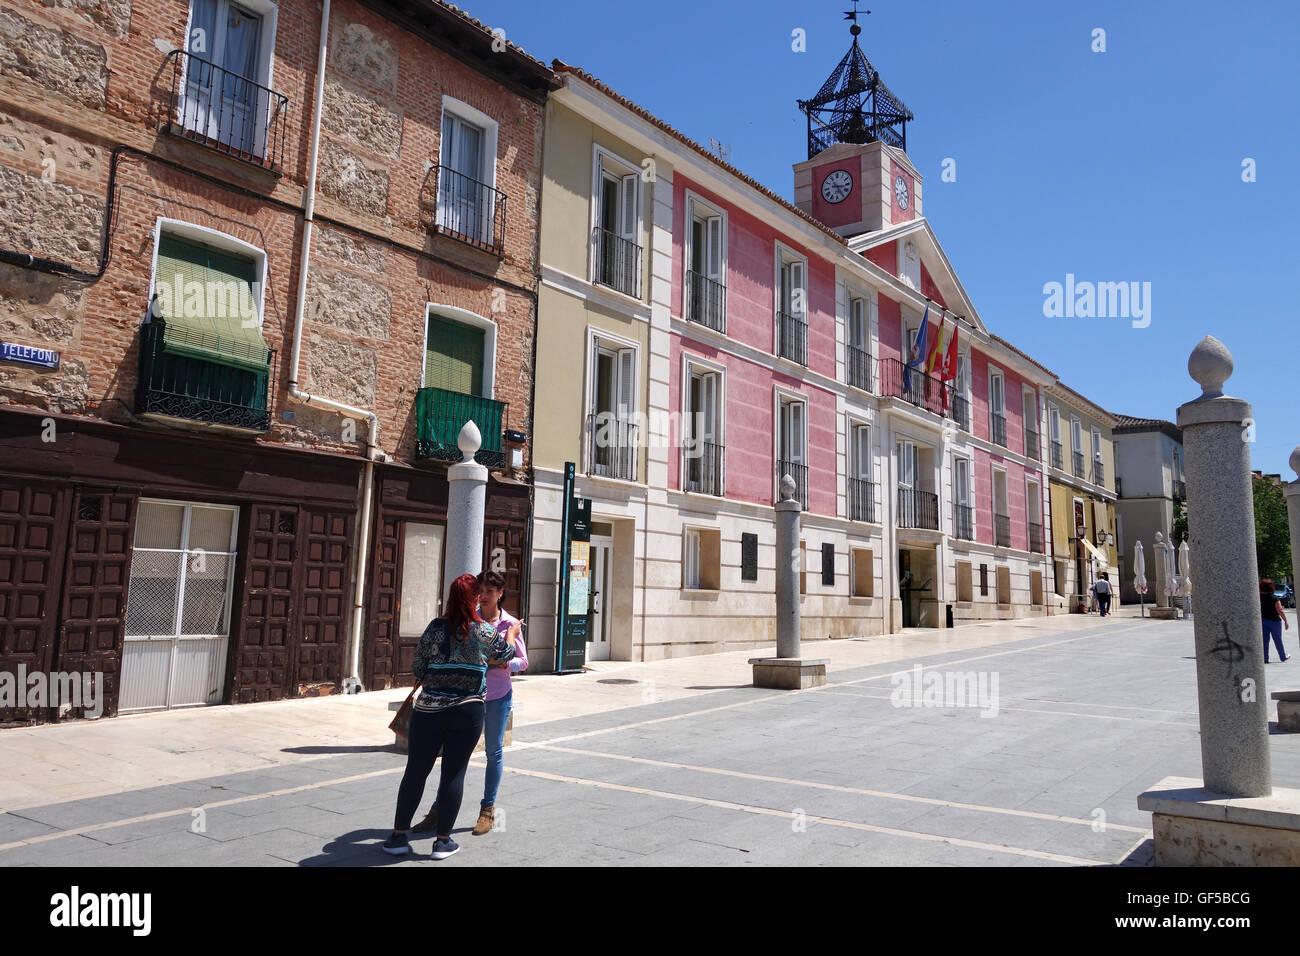 Aranjuez Spain The Servants house or Casa de Empleados - Stock Image